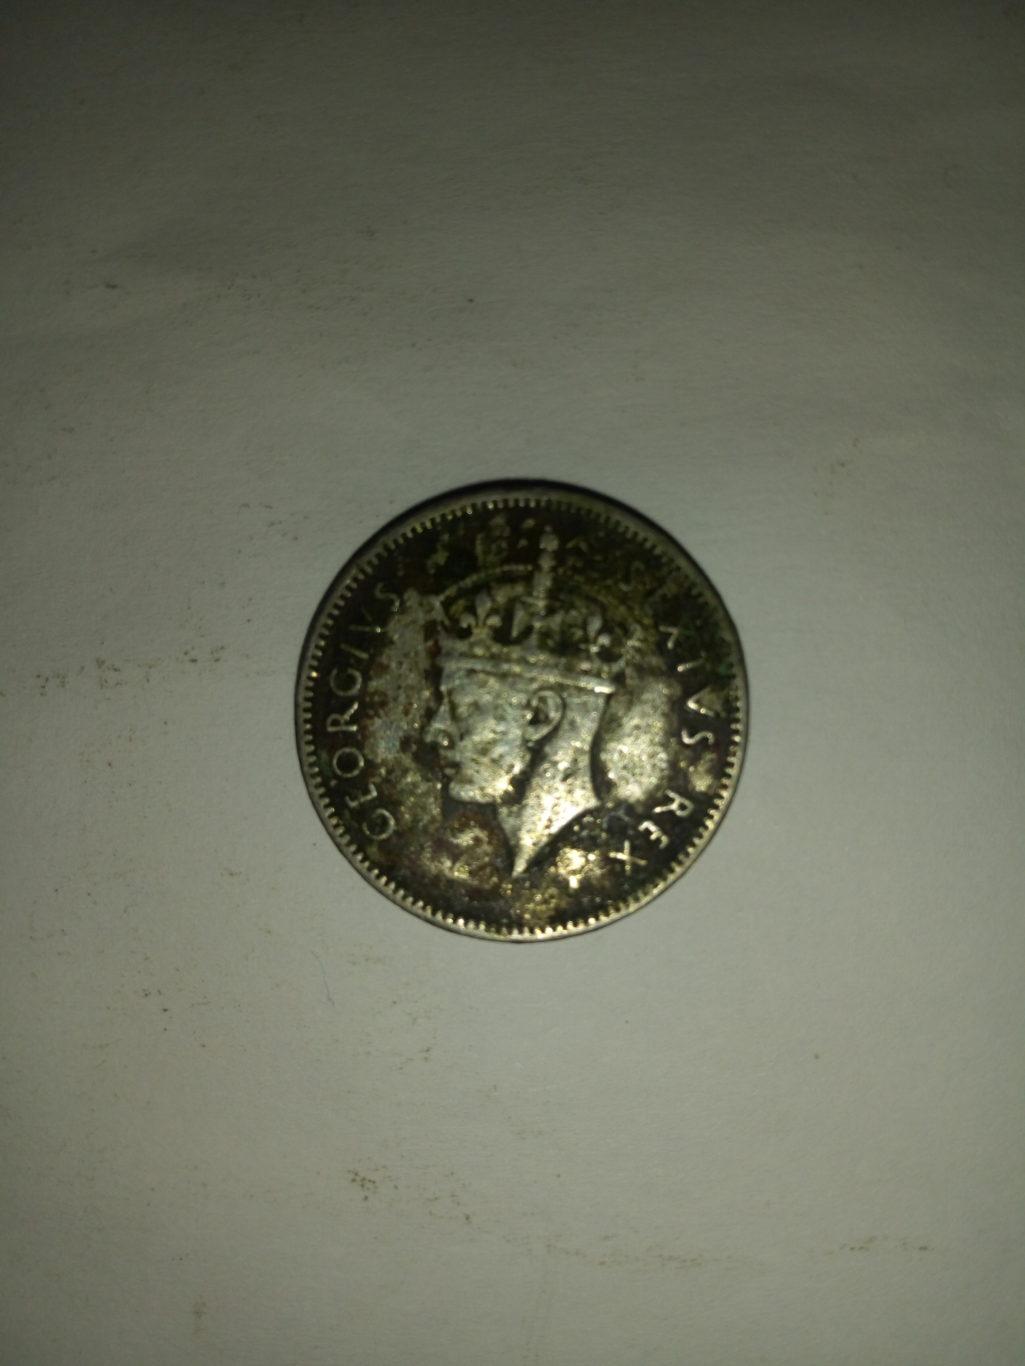 1948_georgivs east Africa 50 half shilling